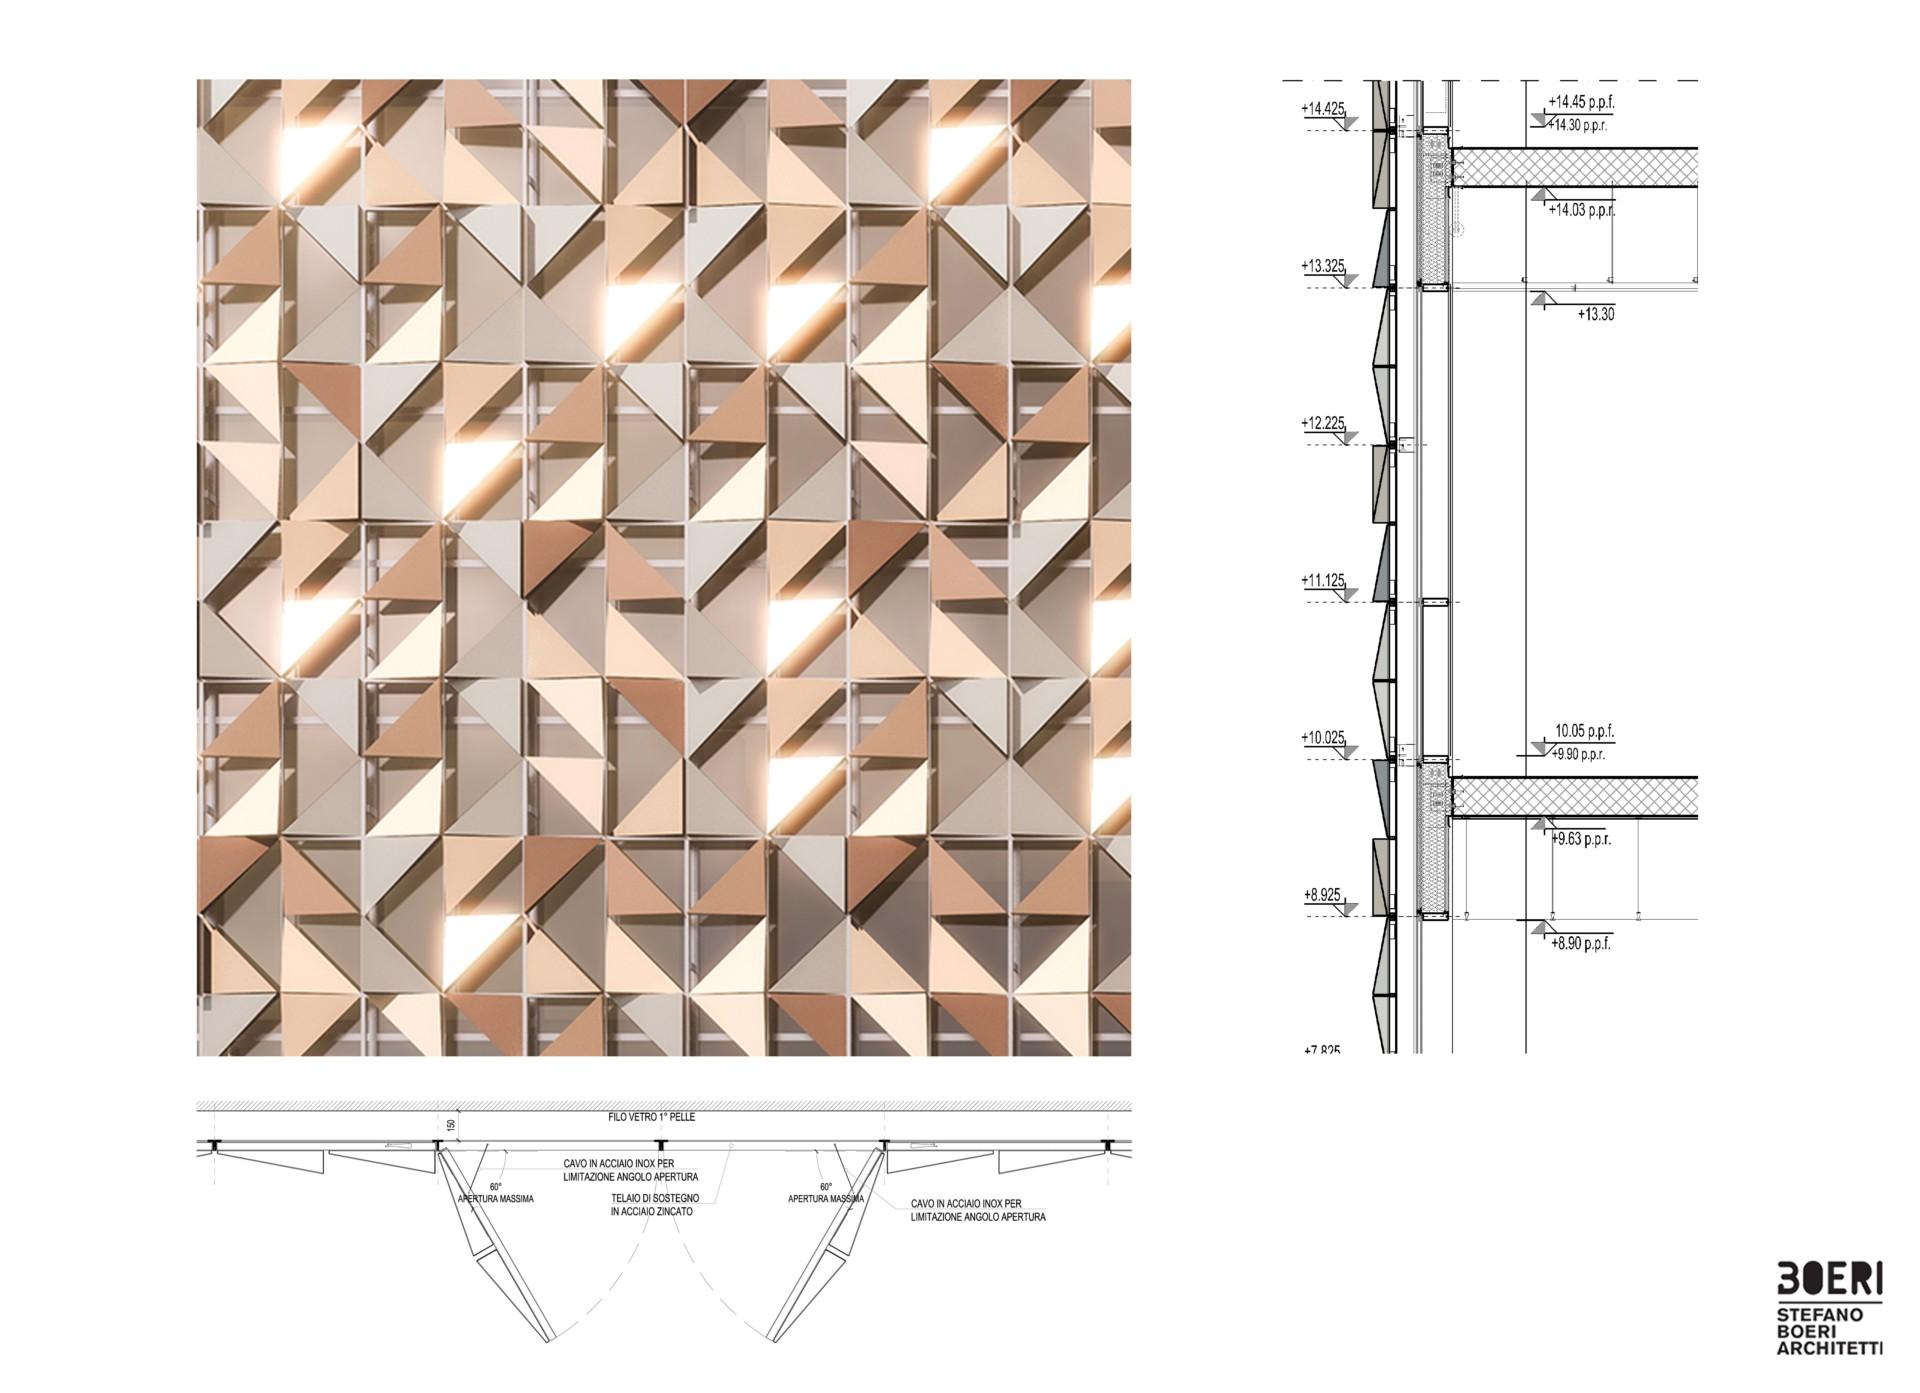 Stefano Boeri Architetti erstes Projekt in Tirana Blloku Cube